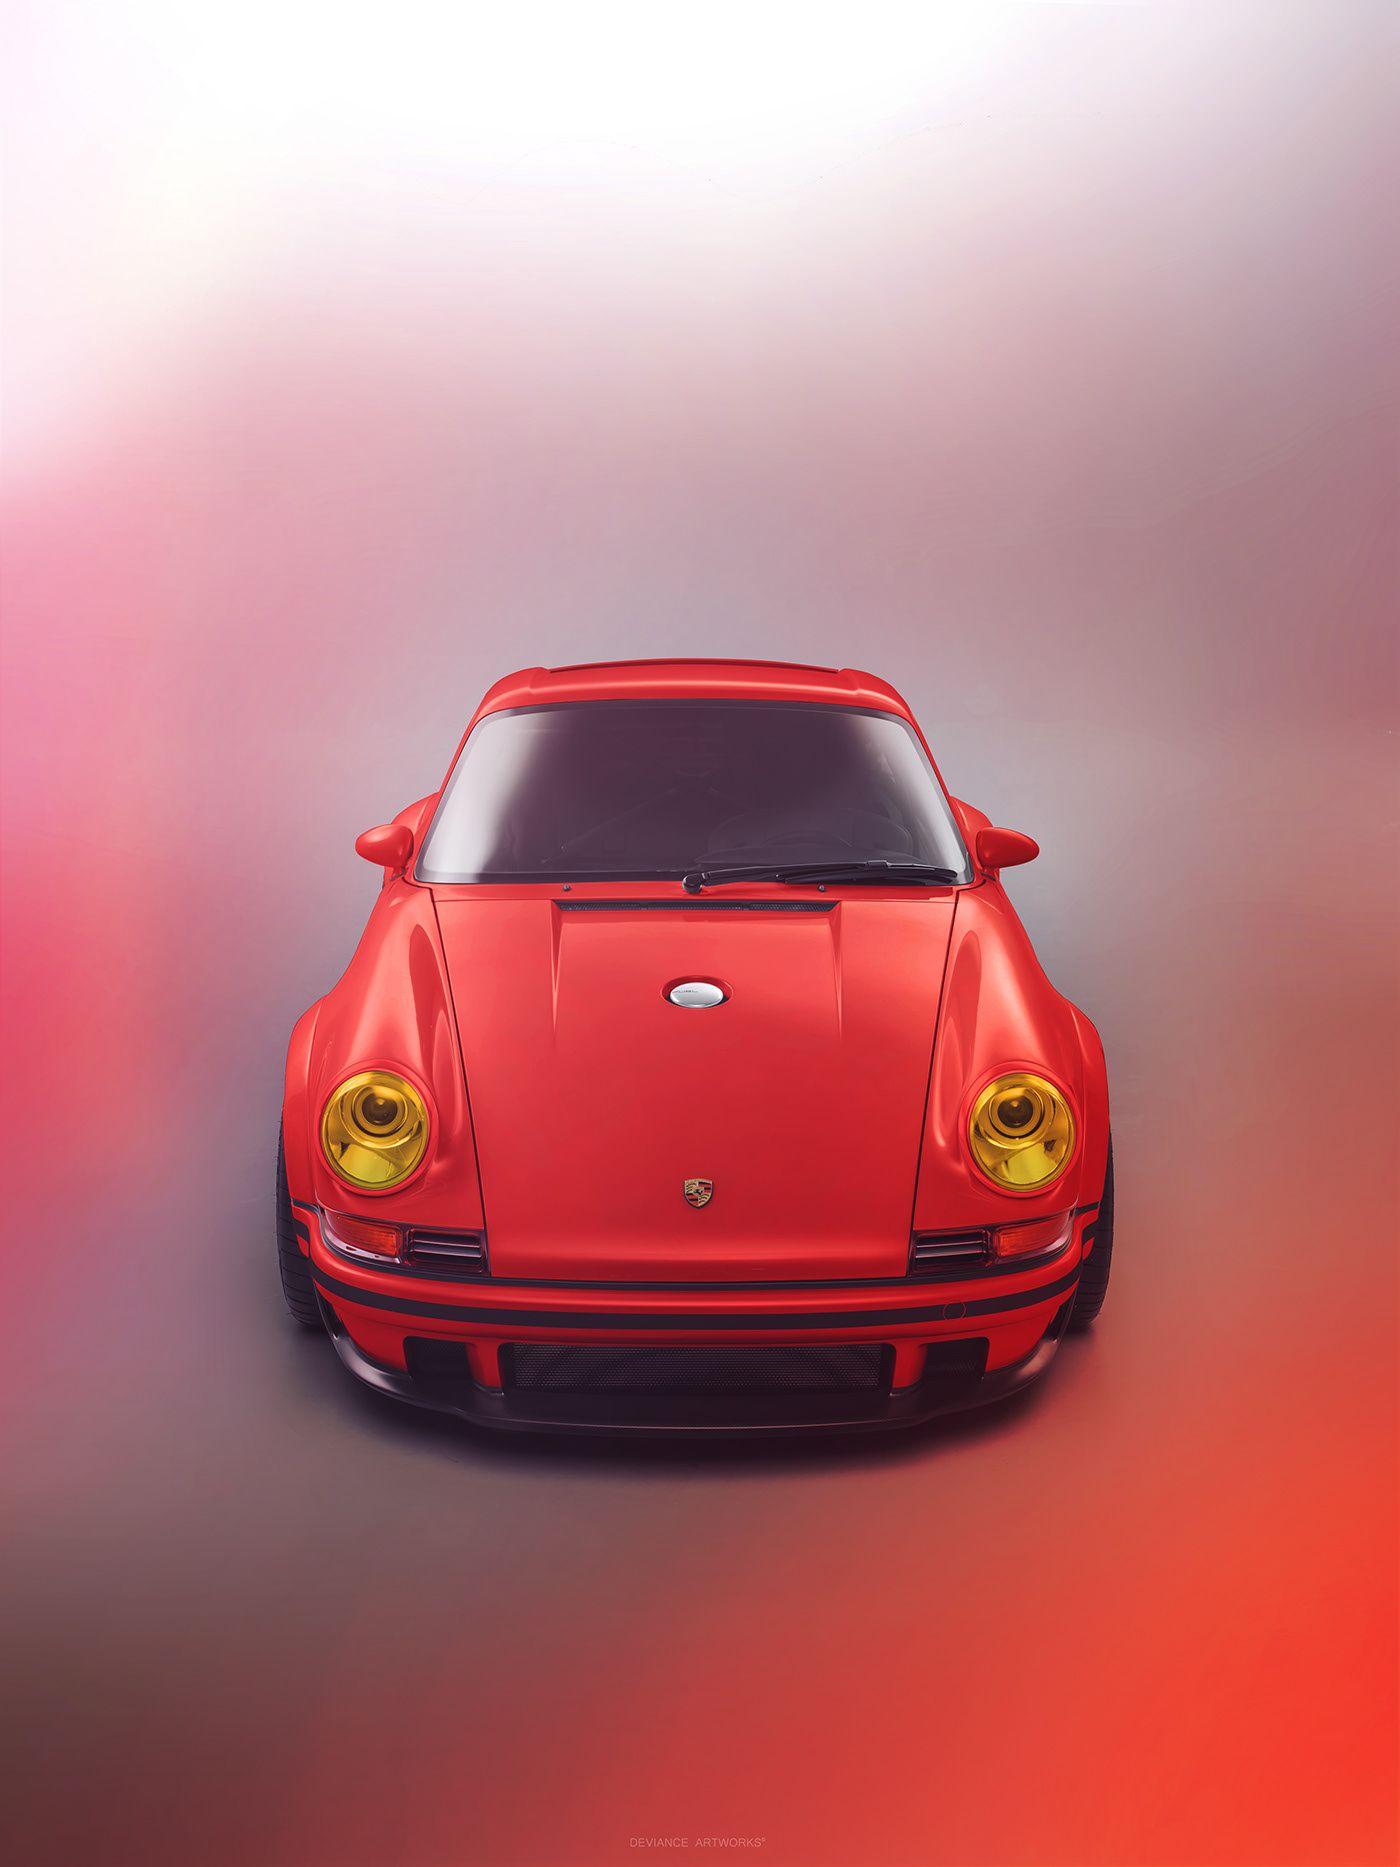 A Colors Story Singer Dls On Behance Singer Vehicle Design Singer Porsche Vintage Porsche Porsche cars hd red behance images